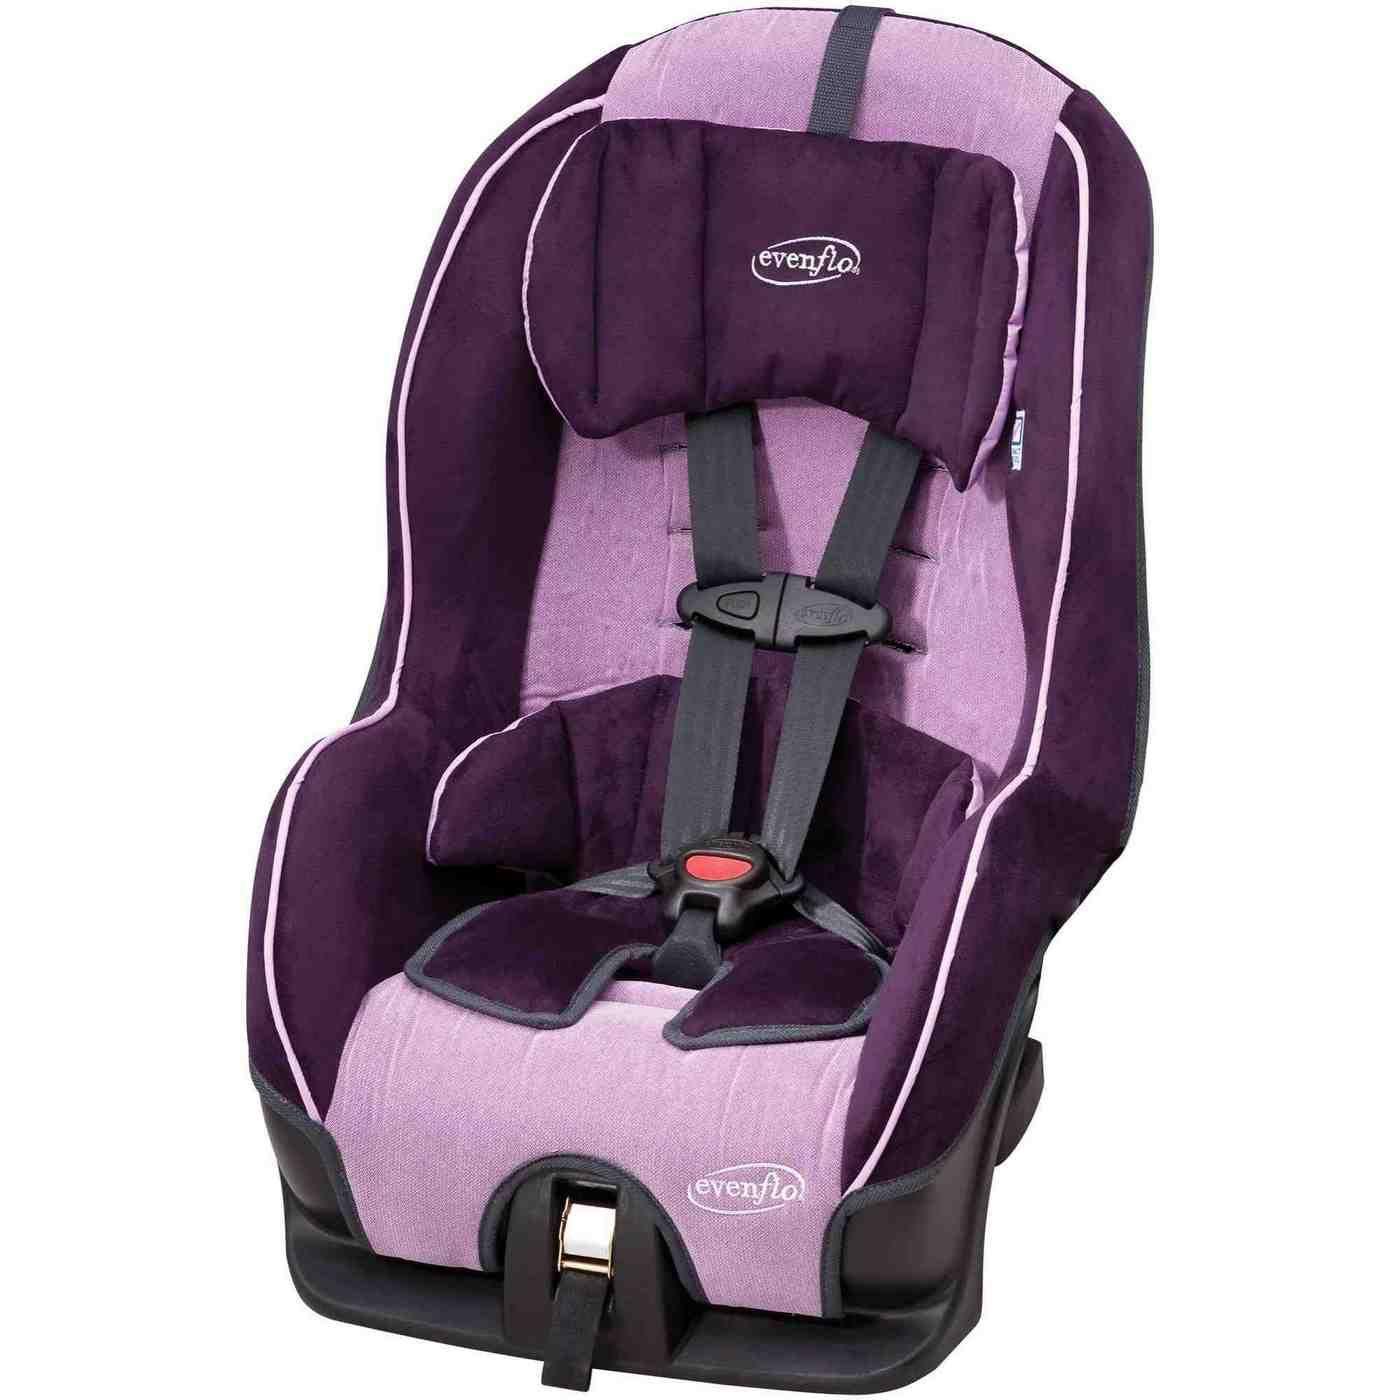 Baby Bike Seat Walmart | baby bike seat | Pinterest | Baby bike and